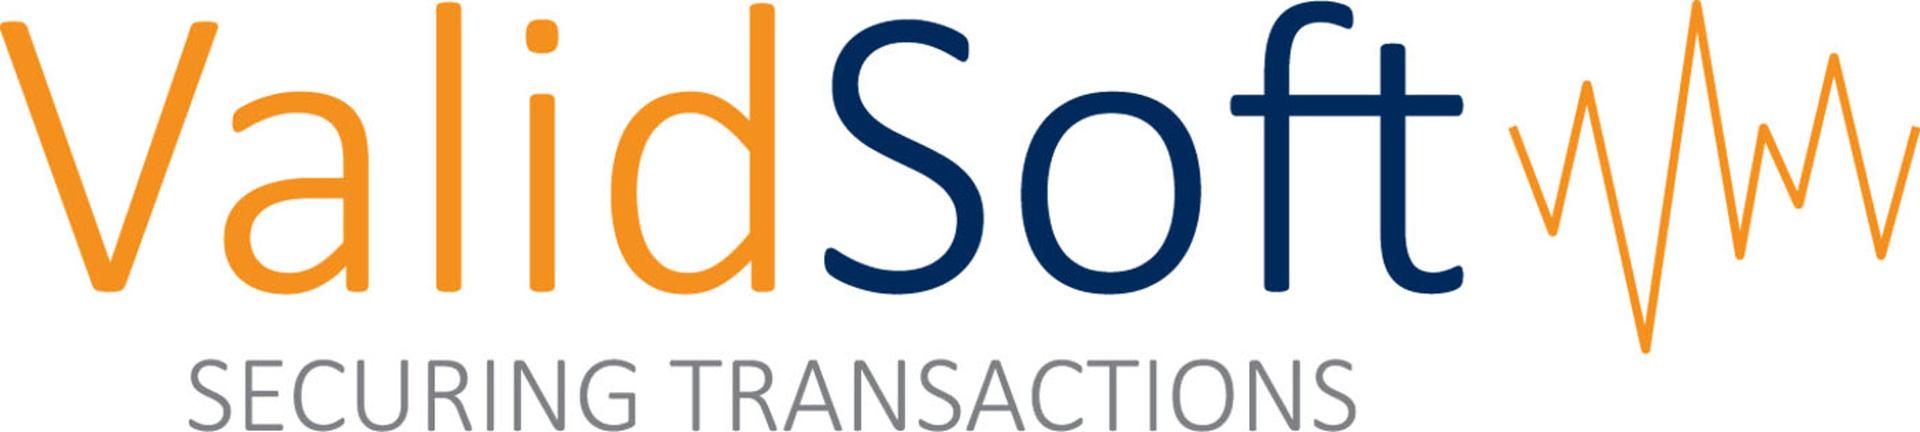 ValidSoft Logo